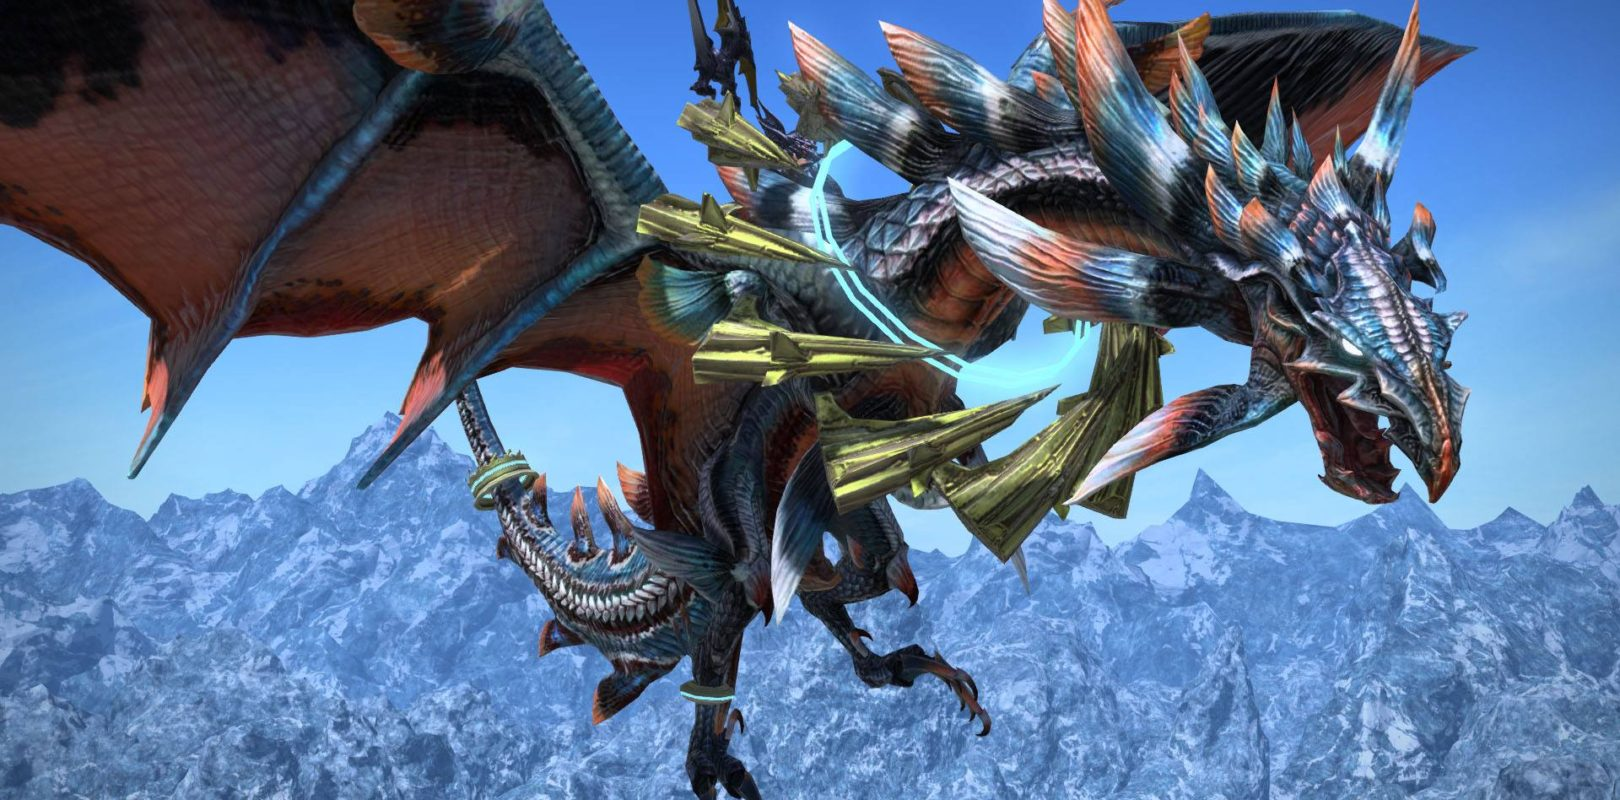 FINAL FANTASY XIV: PvP on the Horizon - Pivotal Gamers